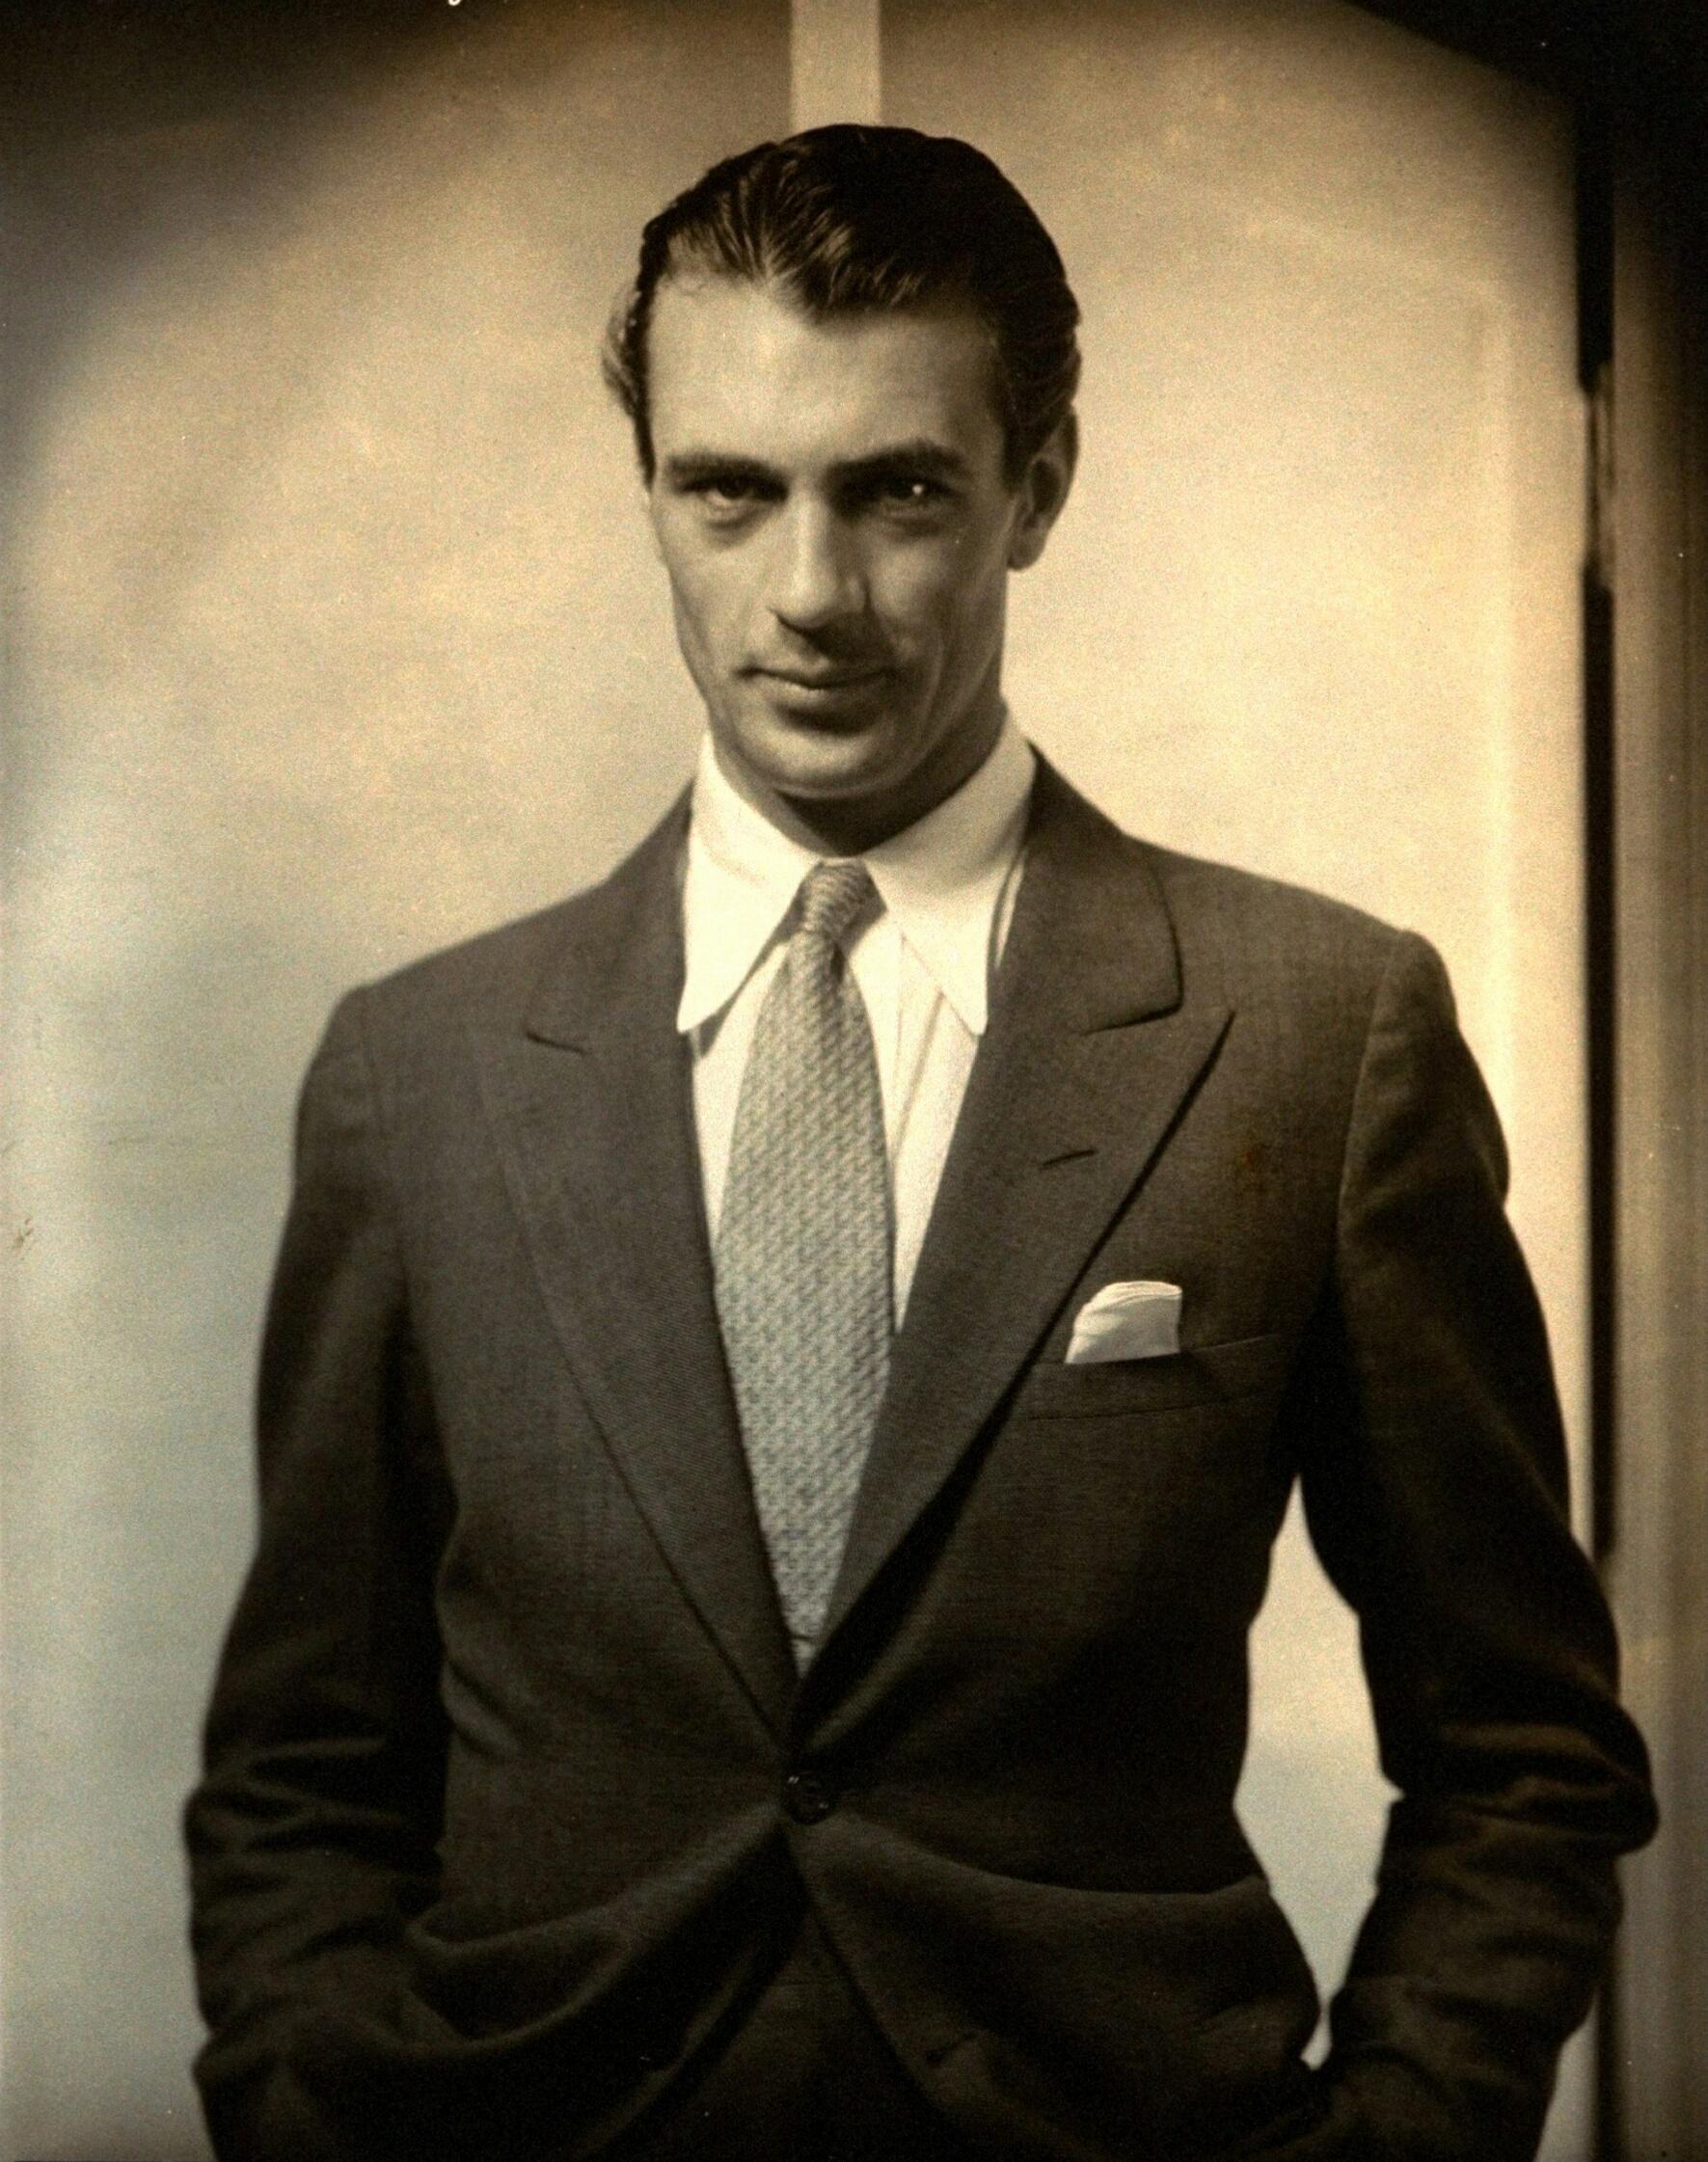 Le choix de Parisian Gentleman : Gary Cooper